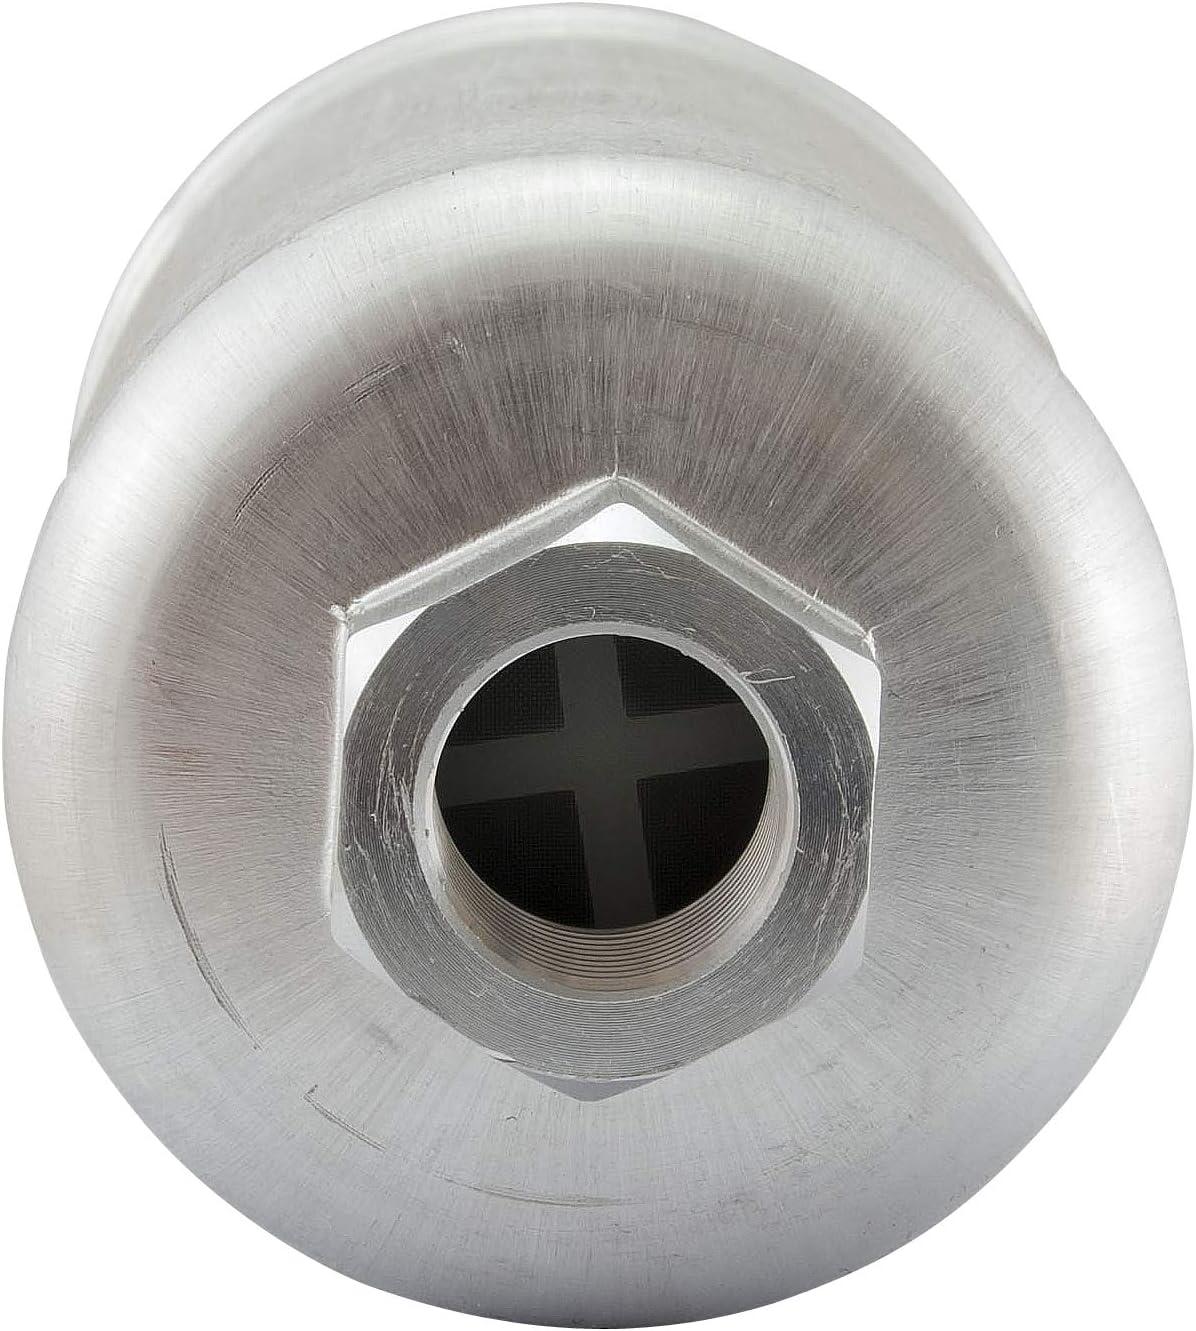 1,6 Liter Aluminium Catchtank inklusive 044 Kraftstoffpumpe